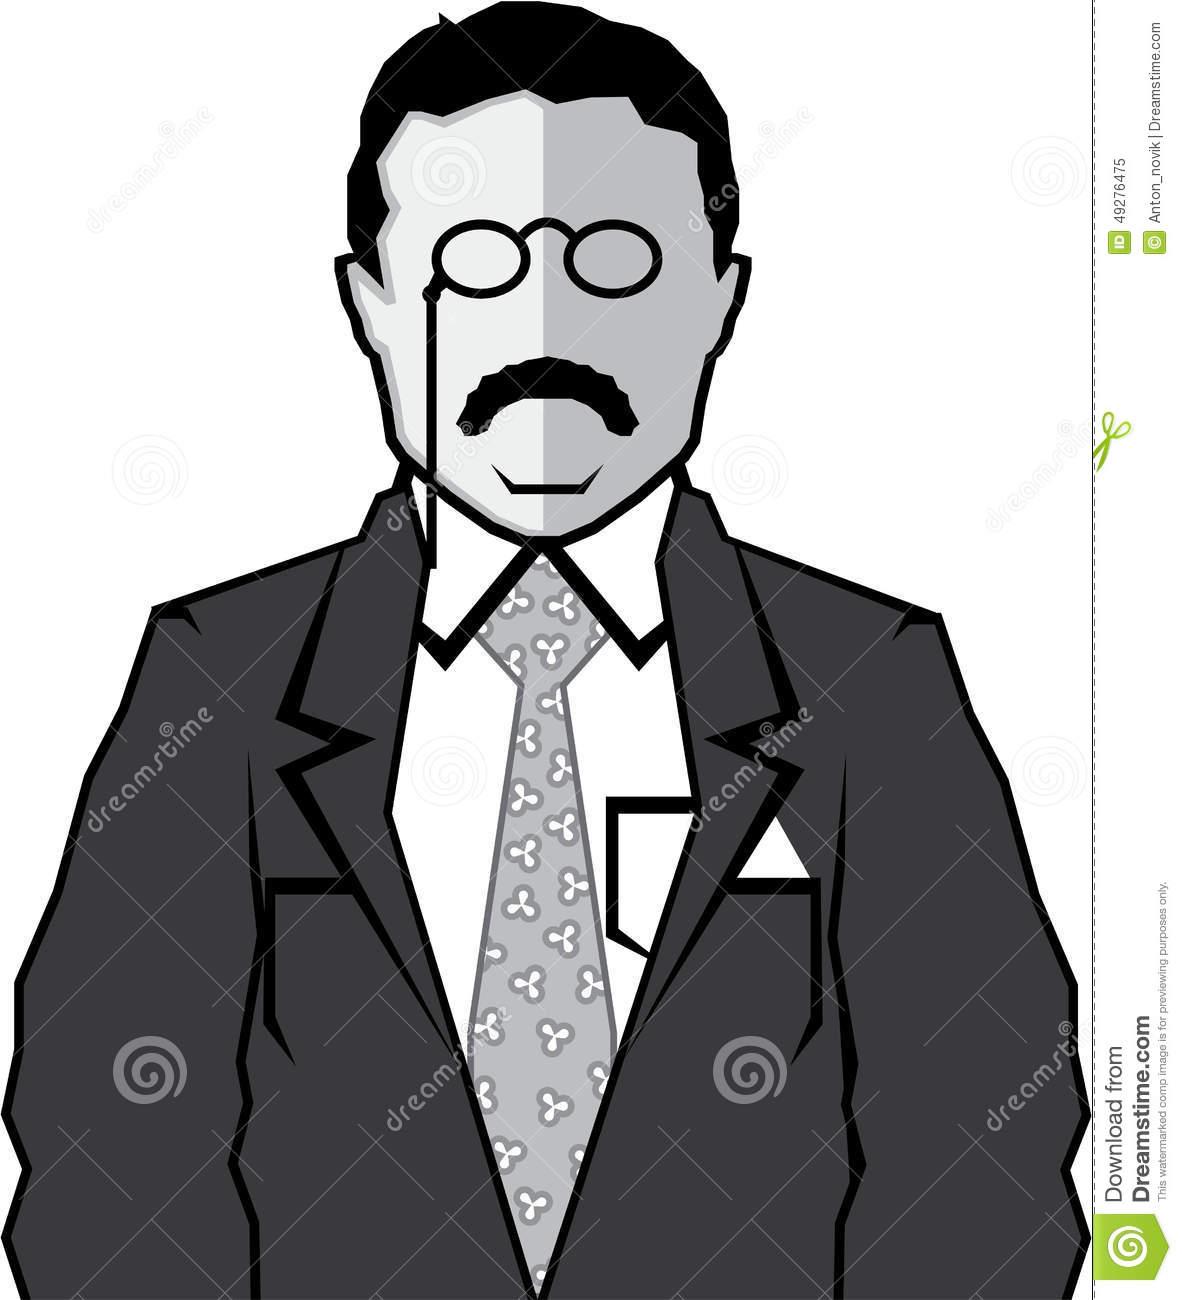 Theodore Roosevelt Cartoon Stock Vector.